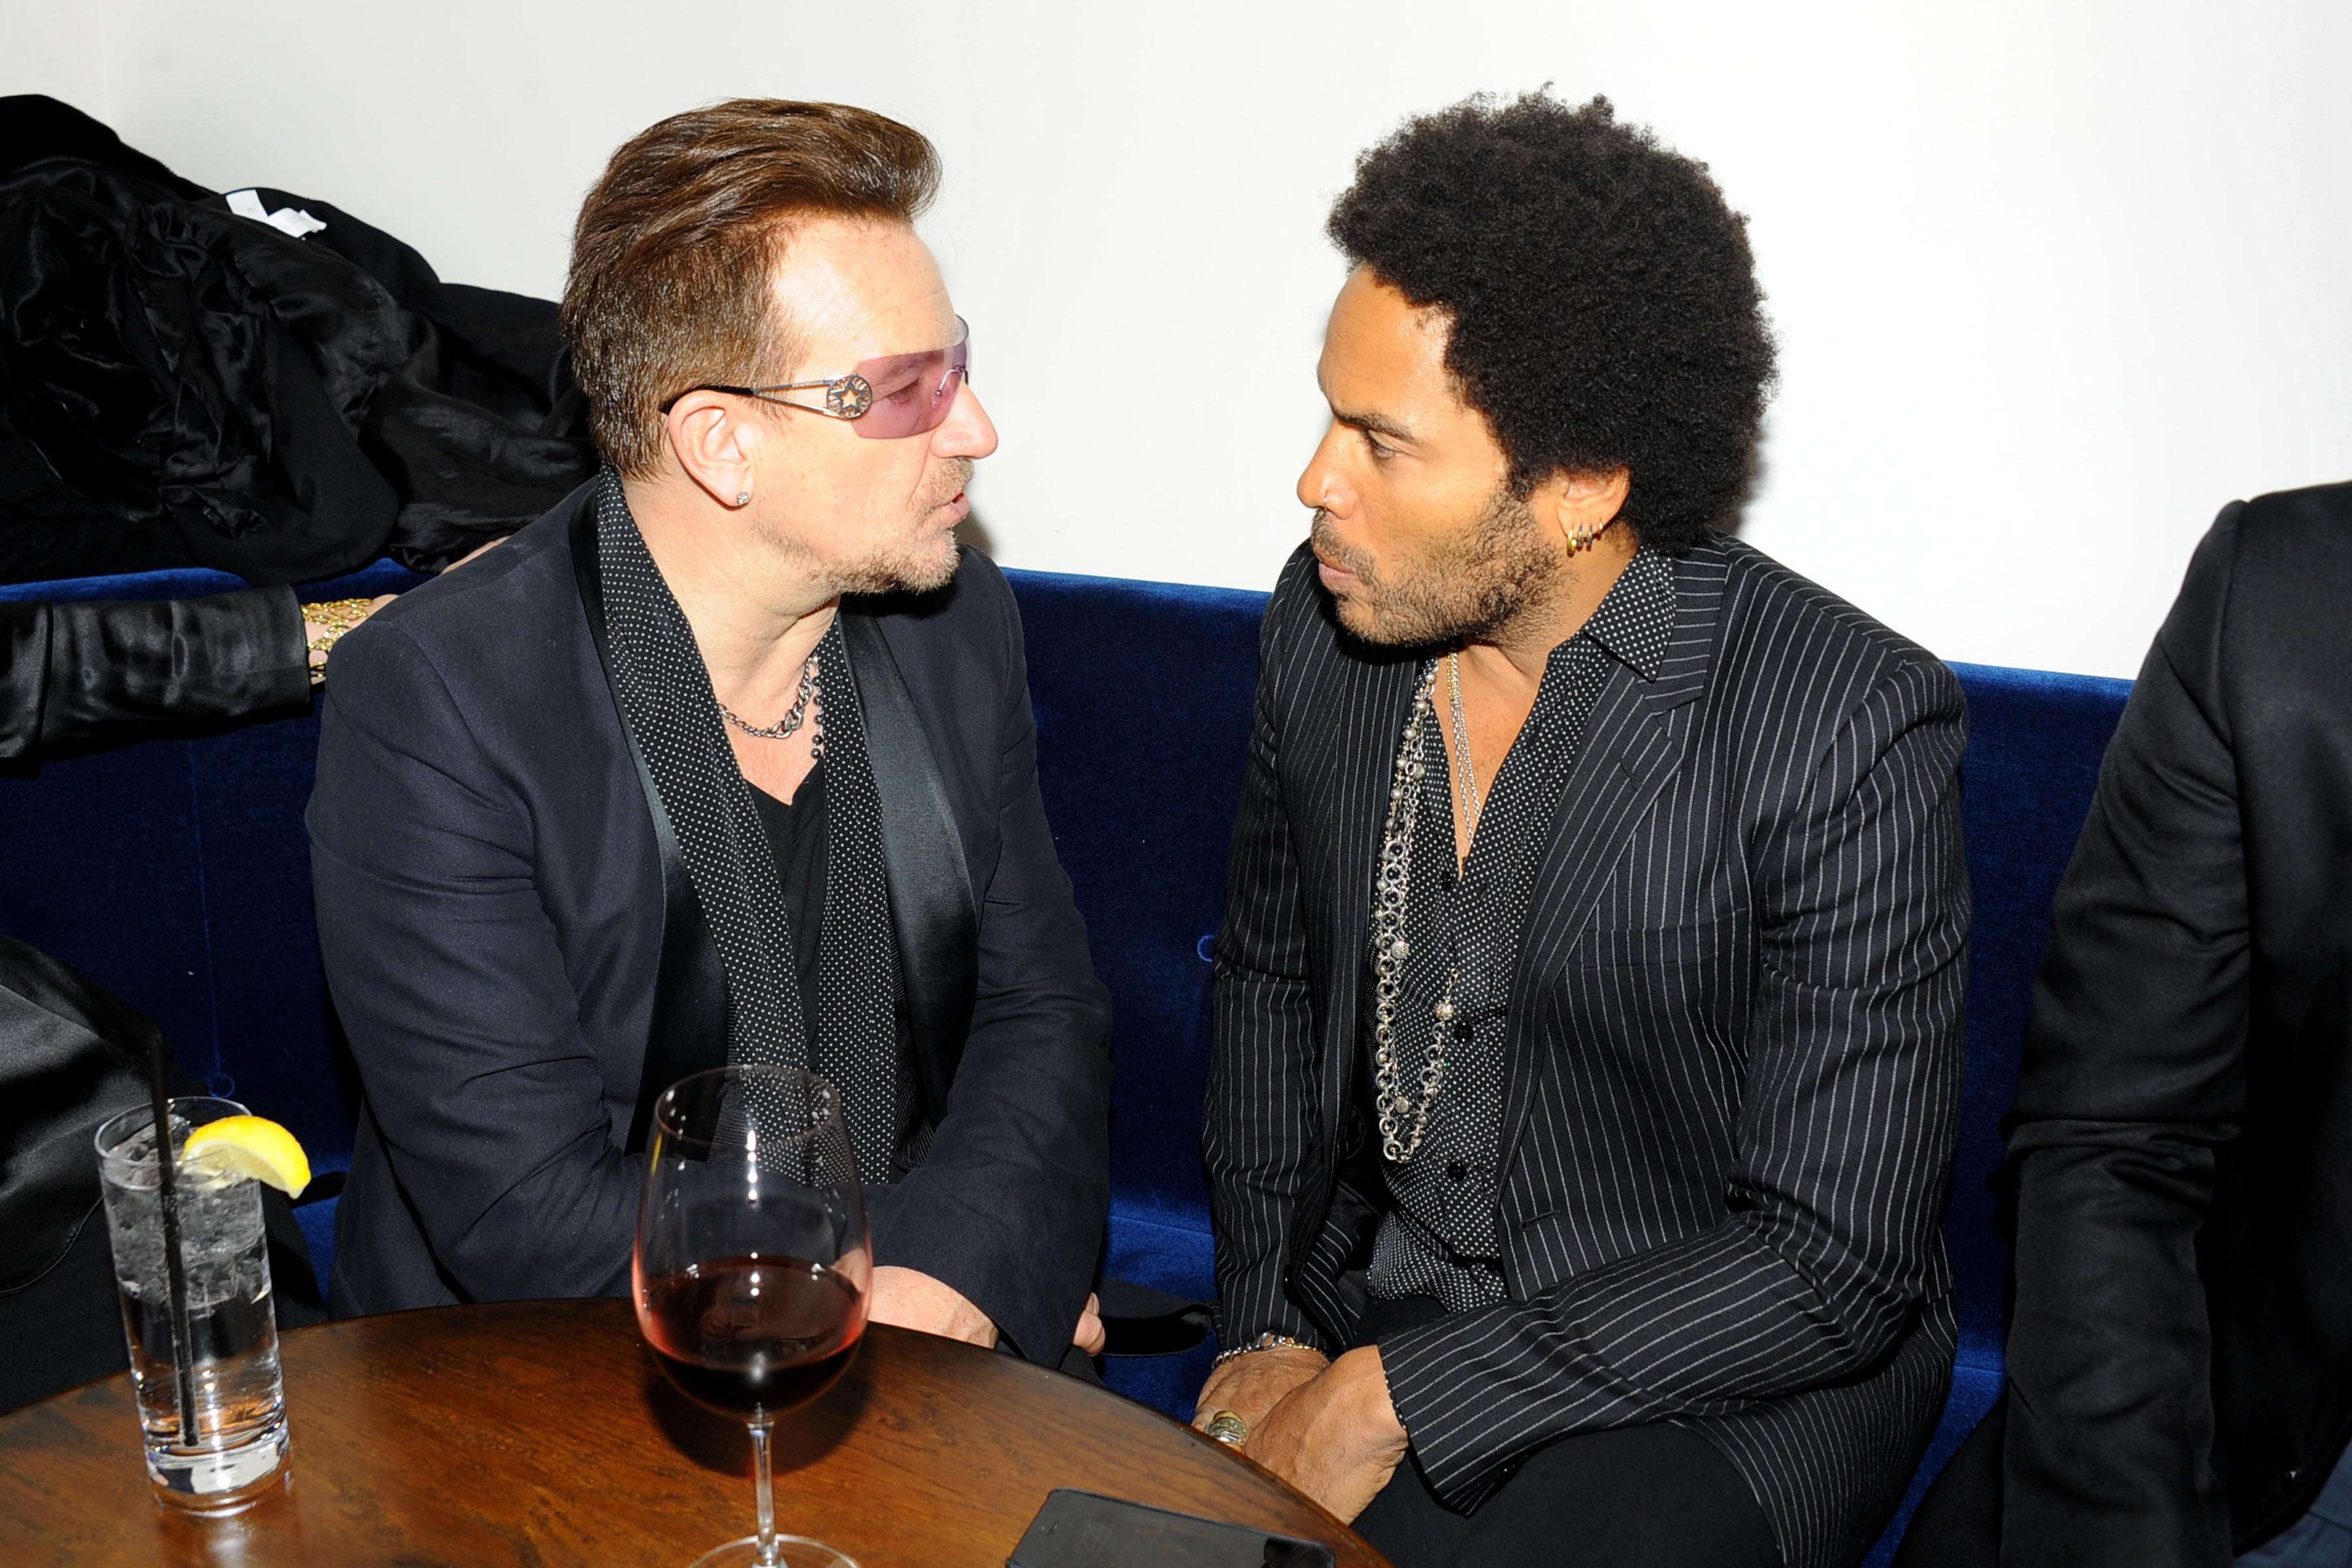 U2, Idris Elba, Naomi Harris, Bob & Harvey Weinstein & Anna Wintour with Burberry host a screening of MANDELA: LONG WALK TO FREEDOM After Part